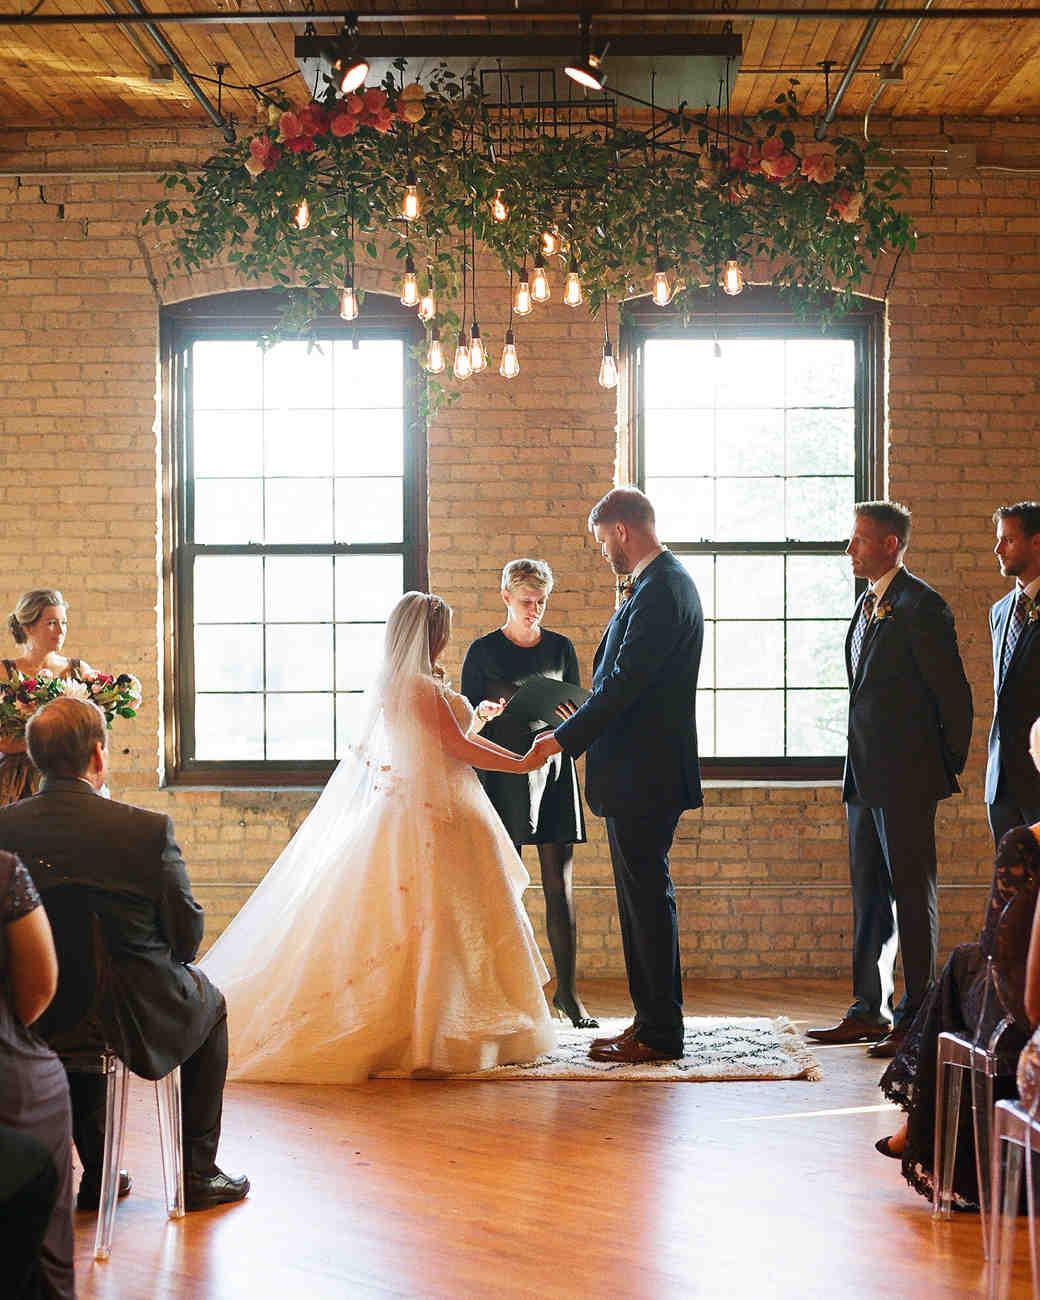 maddy-mike-wedding-ceremony-402.9760.01.2015.49-6134174-0716.jpg